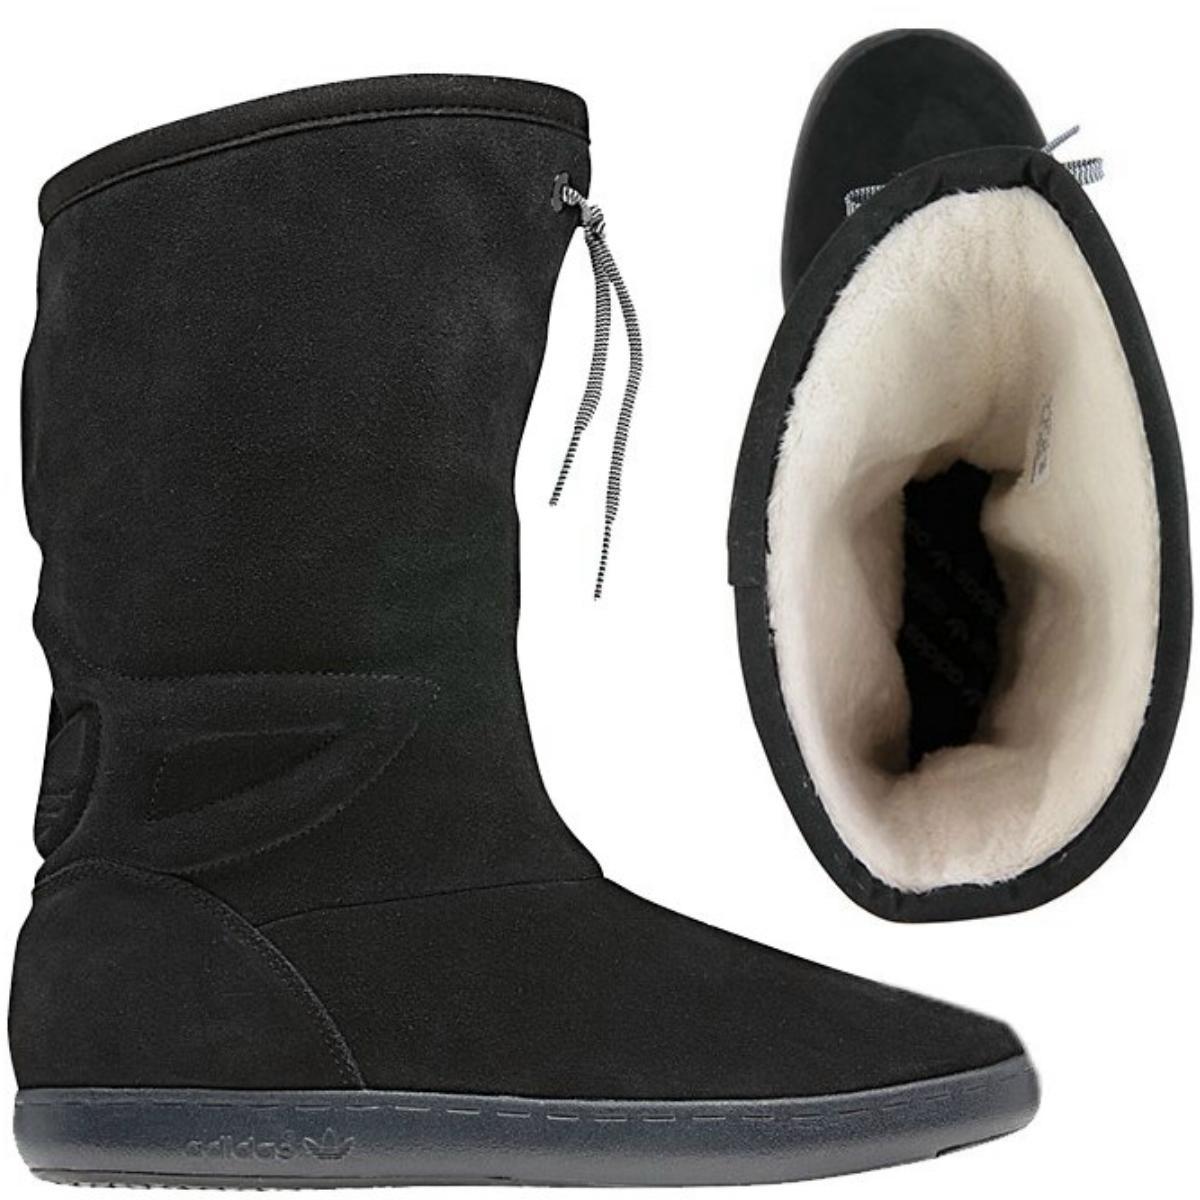 reasonably priced super cheap performance sportswear Adidas Originals Attitude Winter Hi Boots Winterstiefel ...